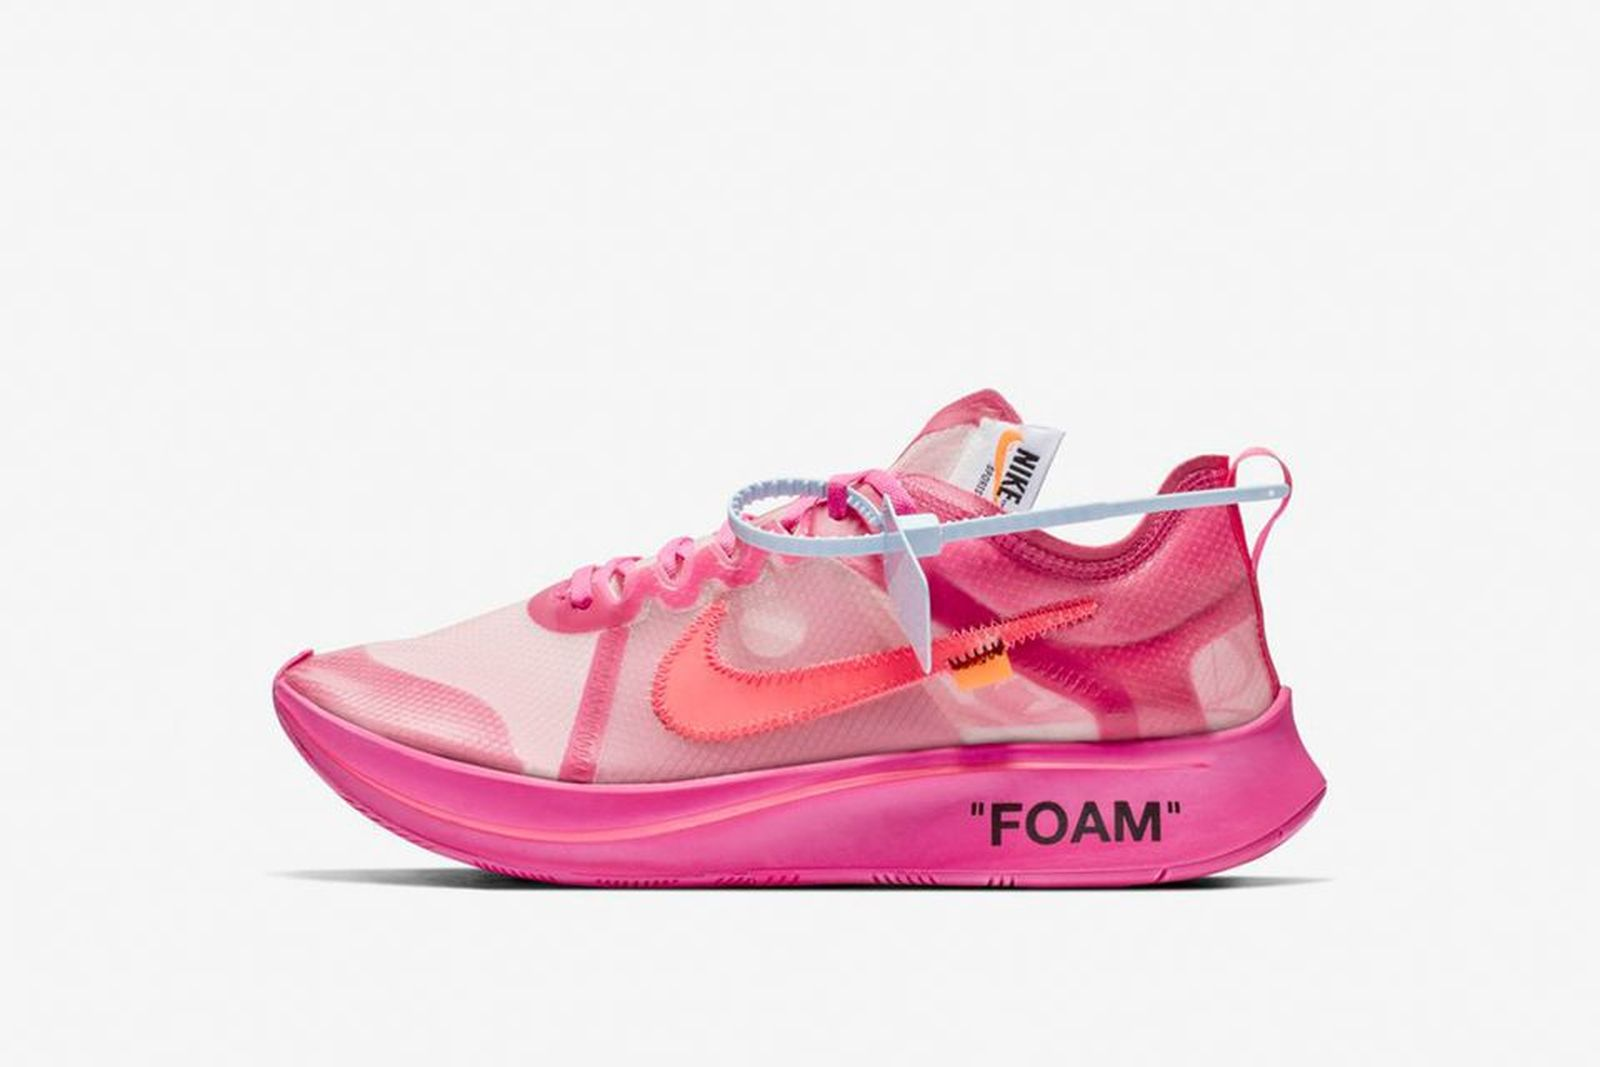 off white zoom fly pink GOAT Nike The Ten OFF-WHITE c/o Virgil Abloh